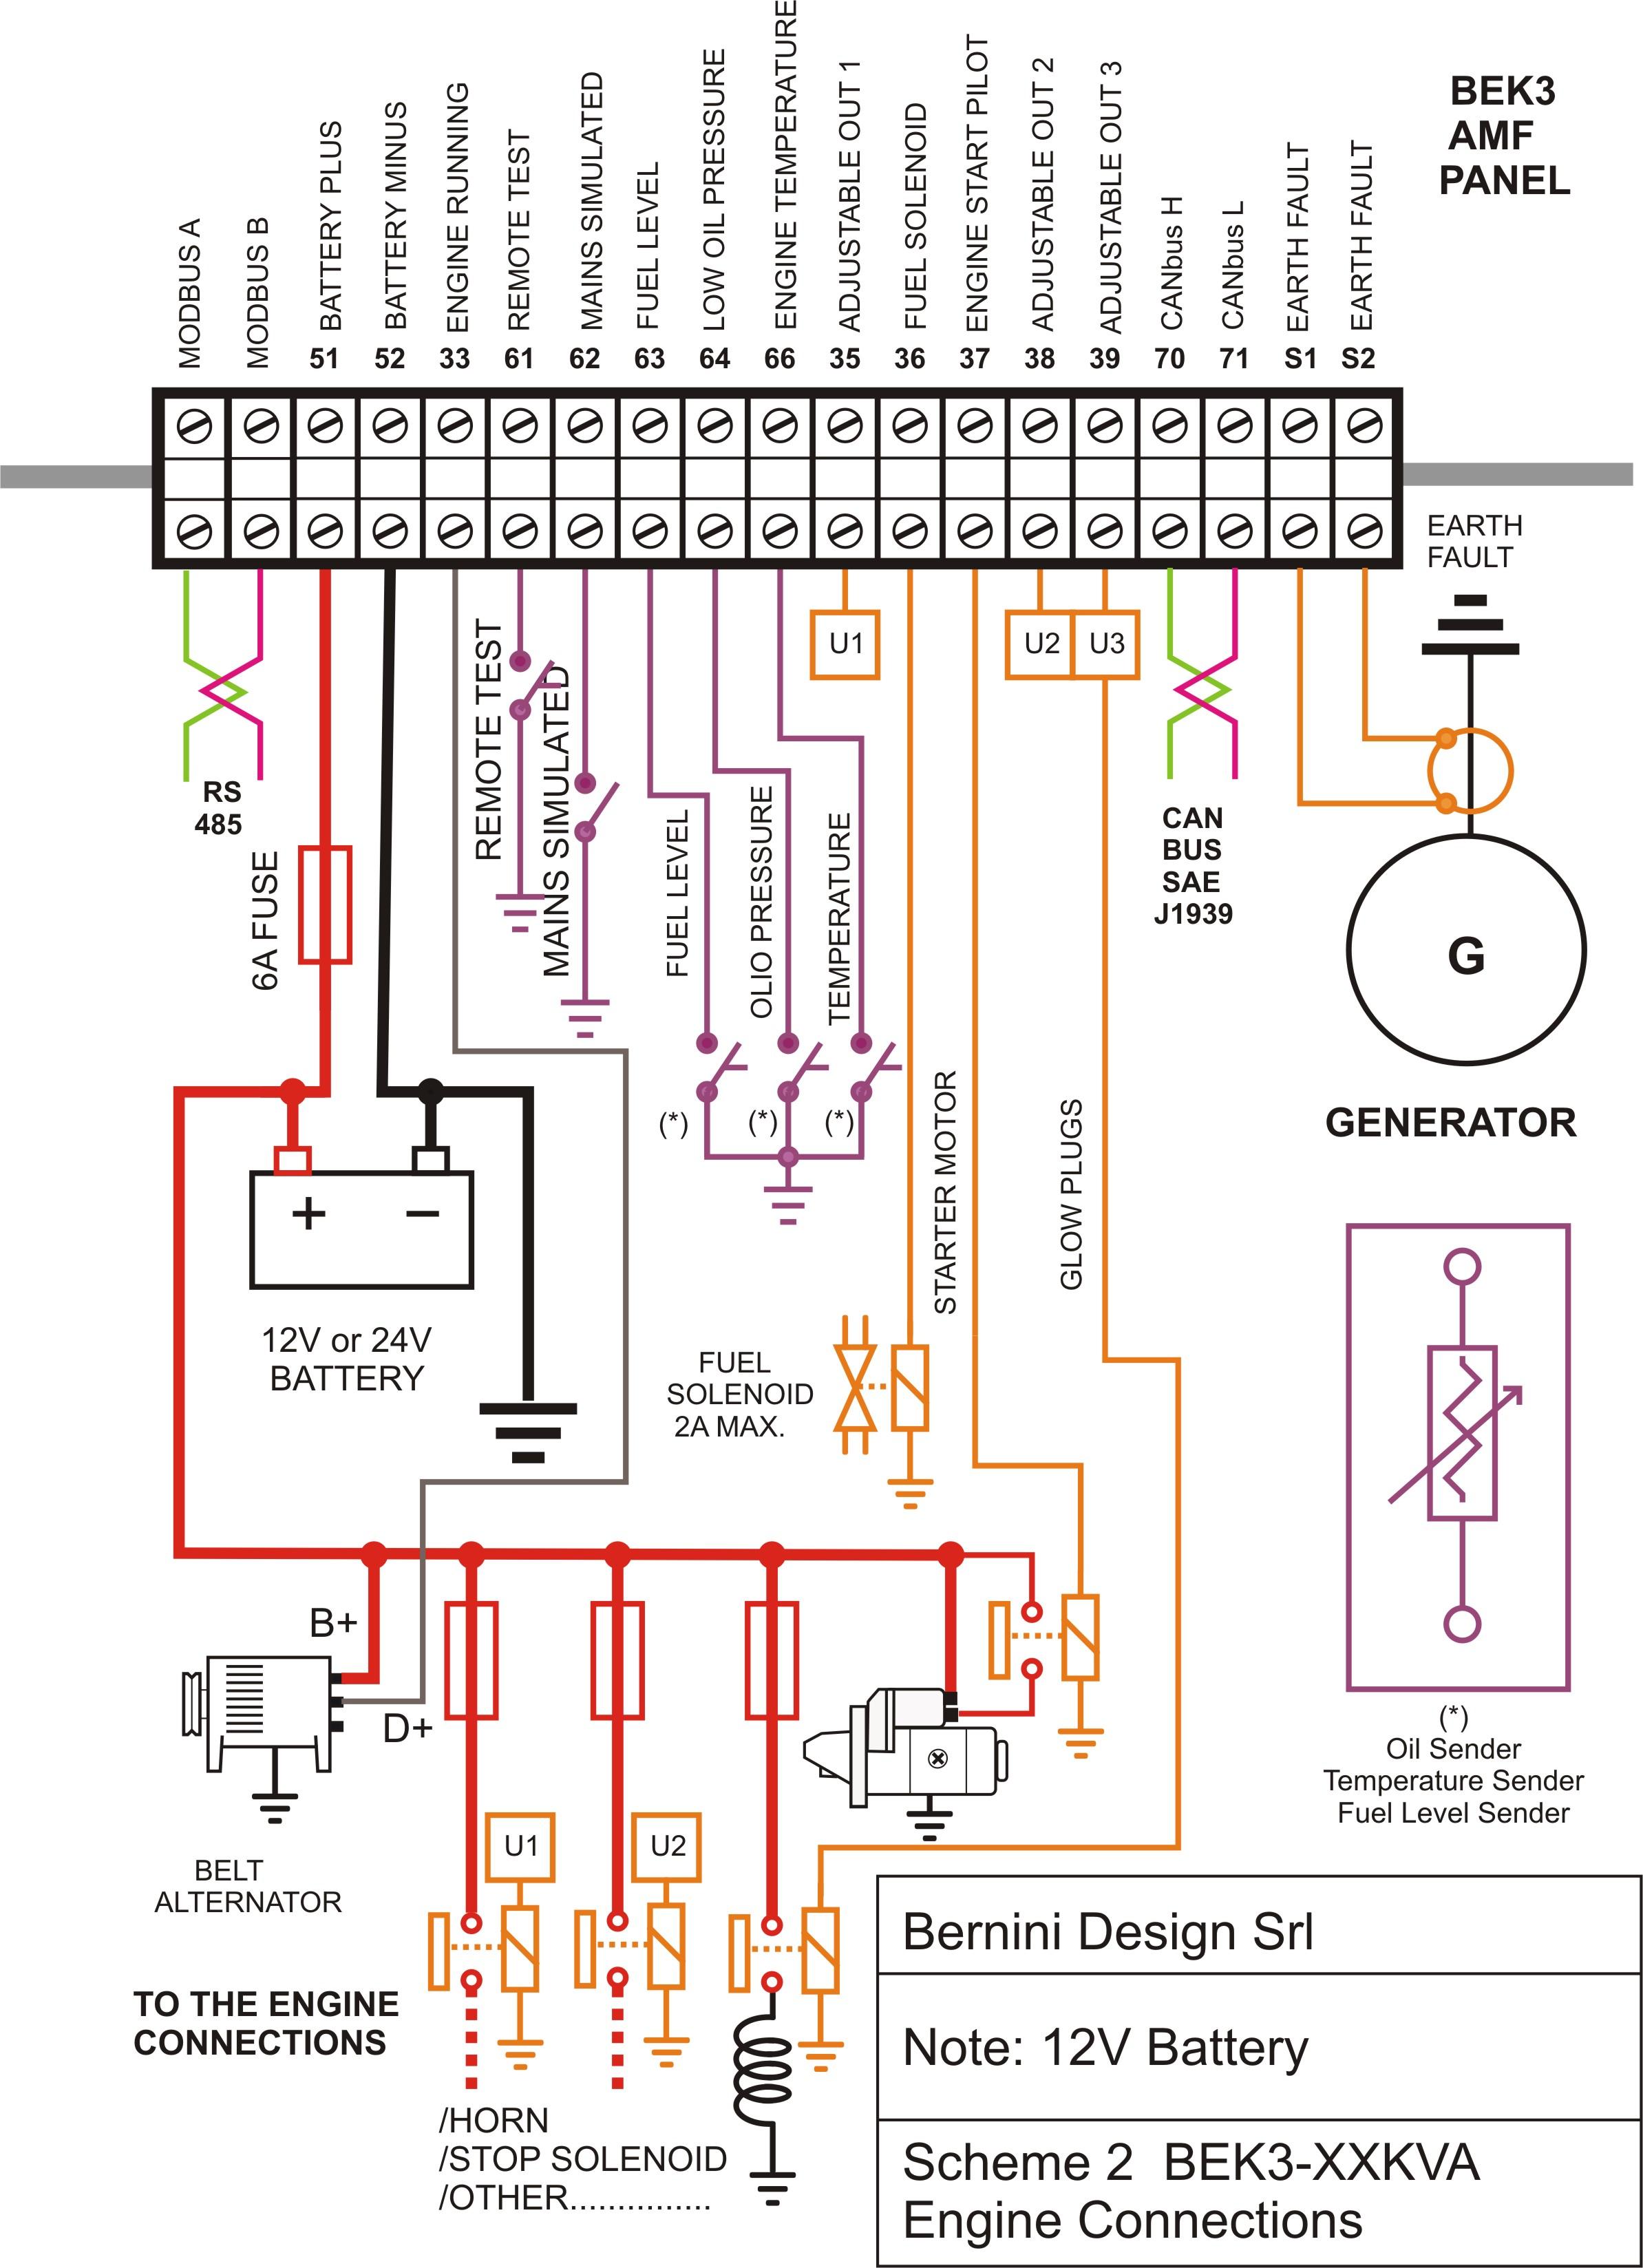 AMF Control Panel Circuit Diagram PDF Engine Connections?resize=665%2C918&ssl=1 3 phase electric motor wiring diagram pdf free sample detail 3 phase house wiring diagram pdf at mifinder.co